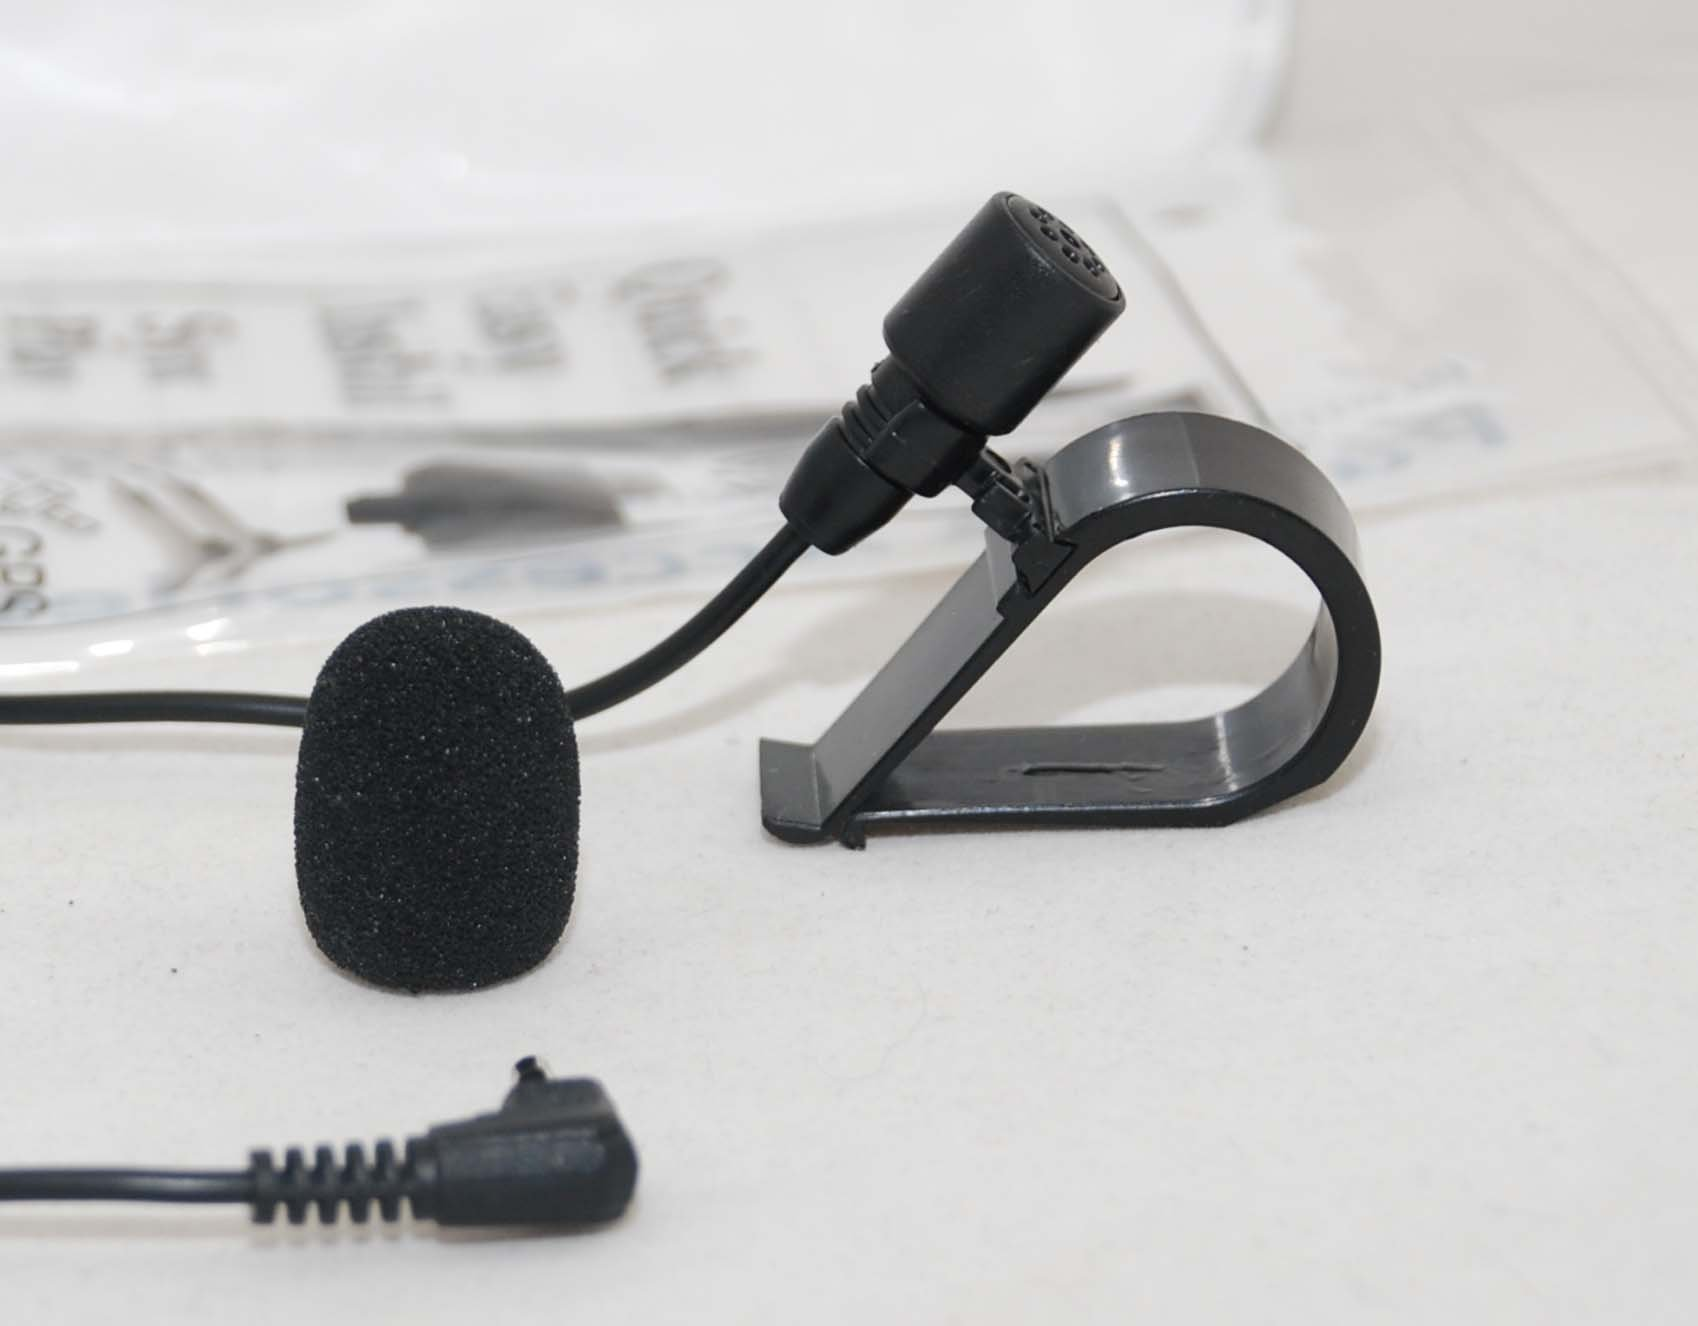 Xtenzi Microphone External Bluetooth Mic Assembly for Jensen Car DVD Nvigtion Sterio Recivers.